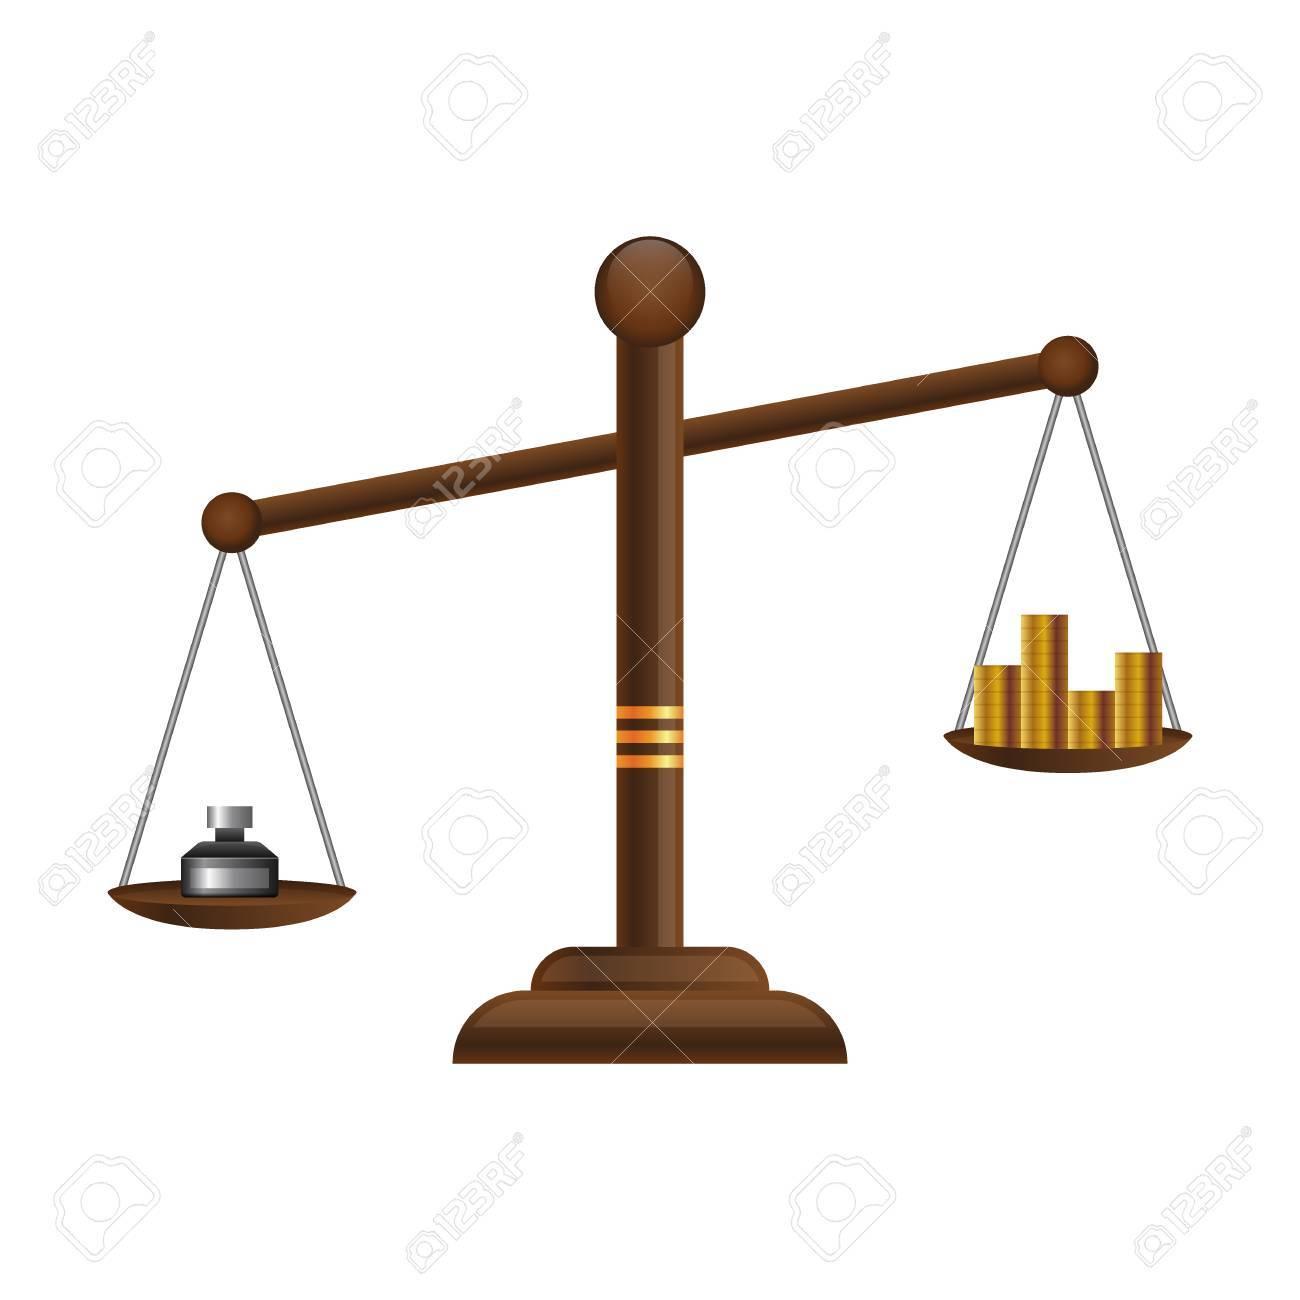 justice scales icon law balance symbol libra flat design with rh 123rf com